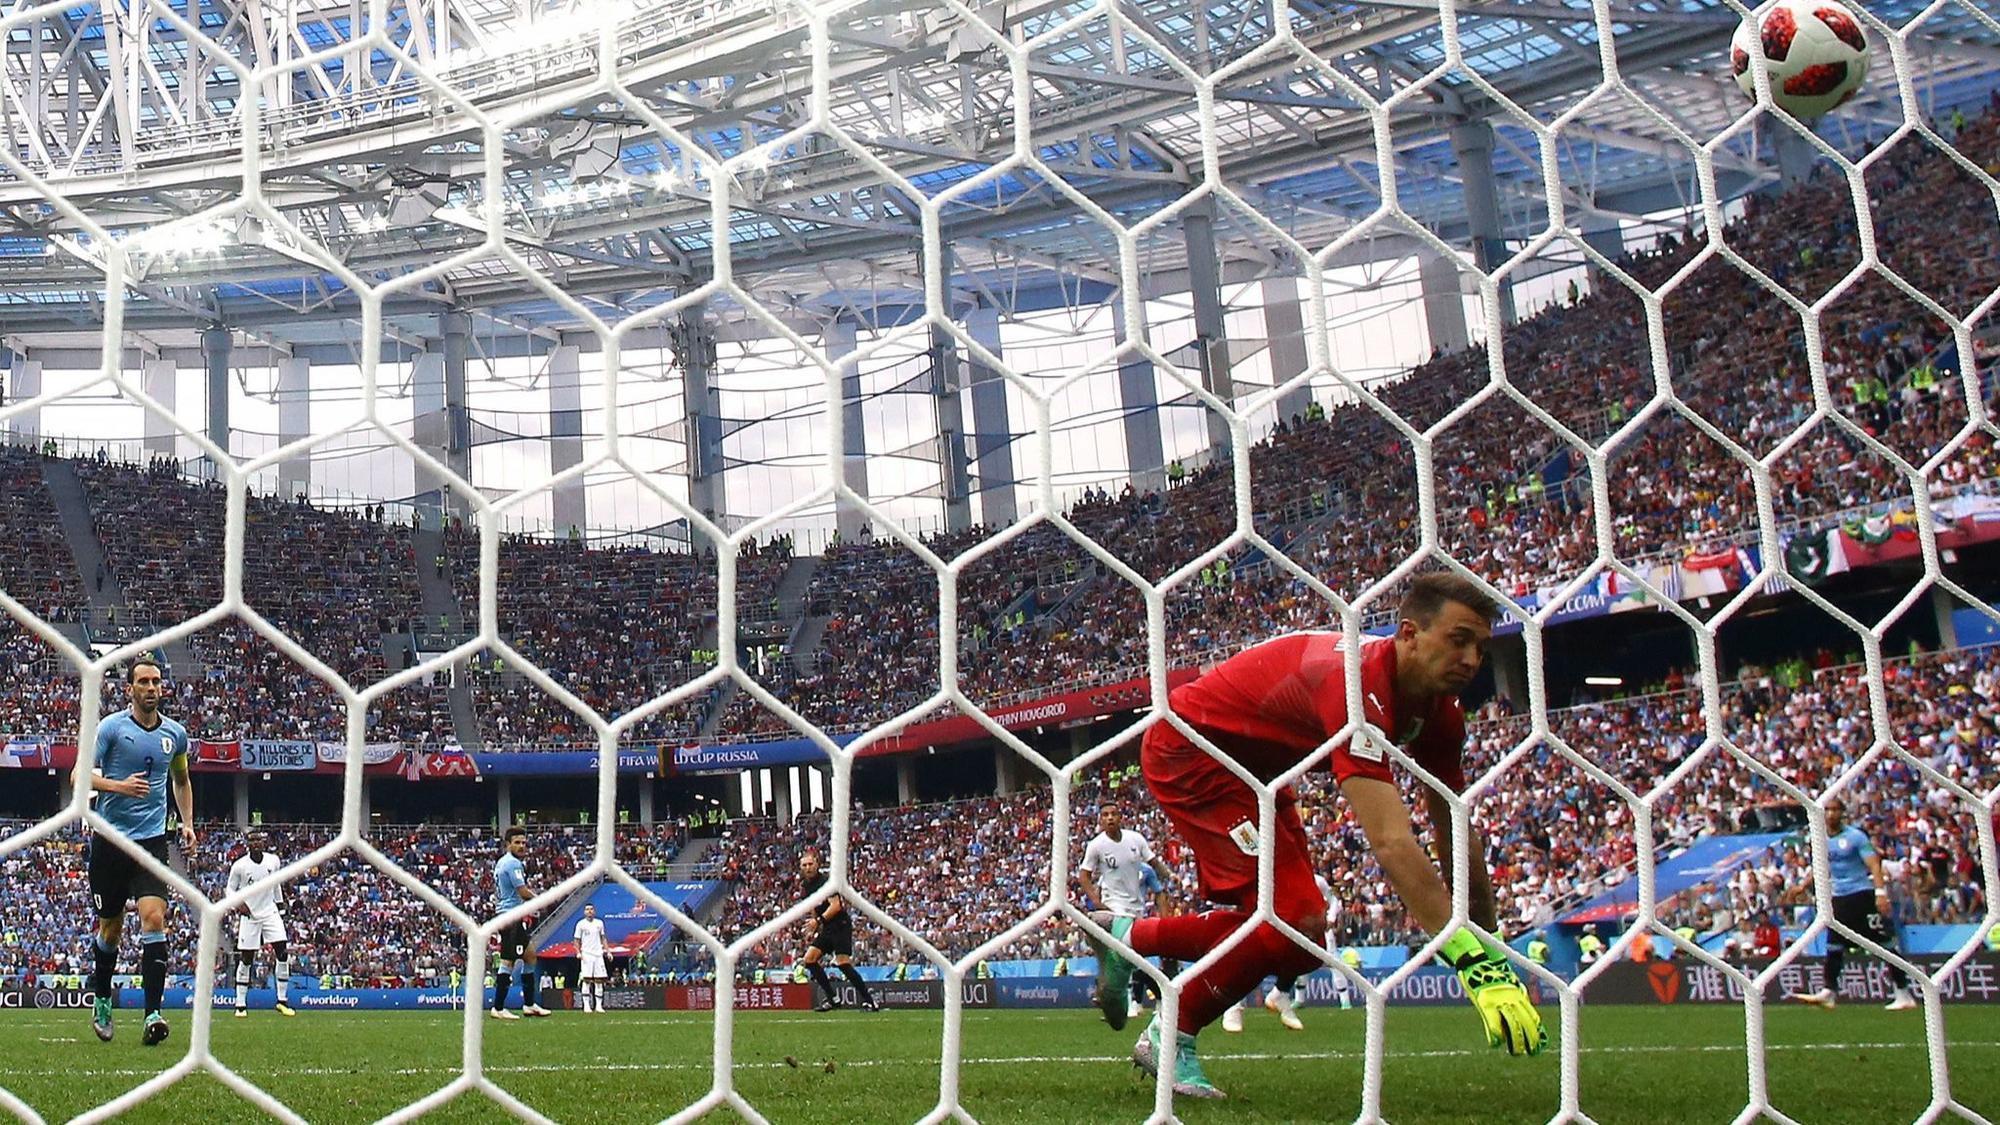 http://www.trbimg.com/img-5b3f9010/turbine/ct-90mins-the-latest-france-lead-uruguay-at-halftime-on-varanes-goal-20180706